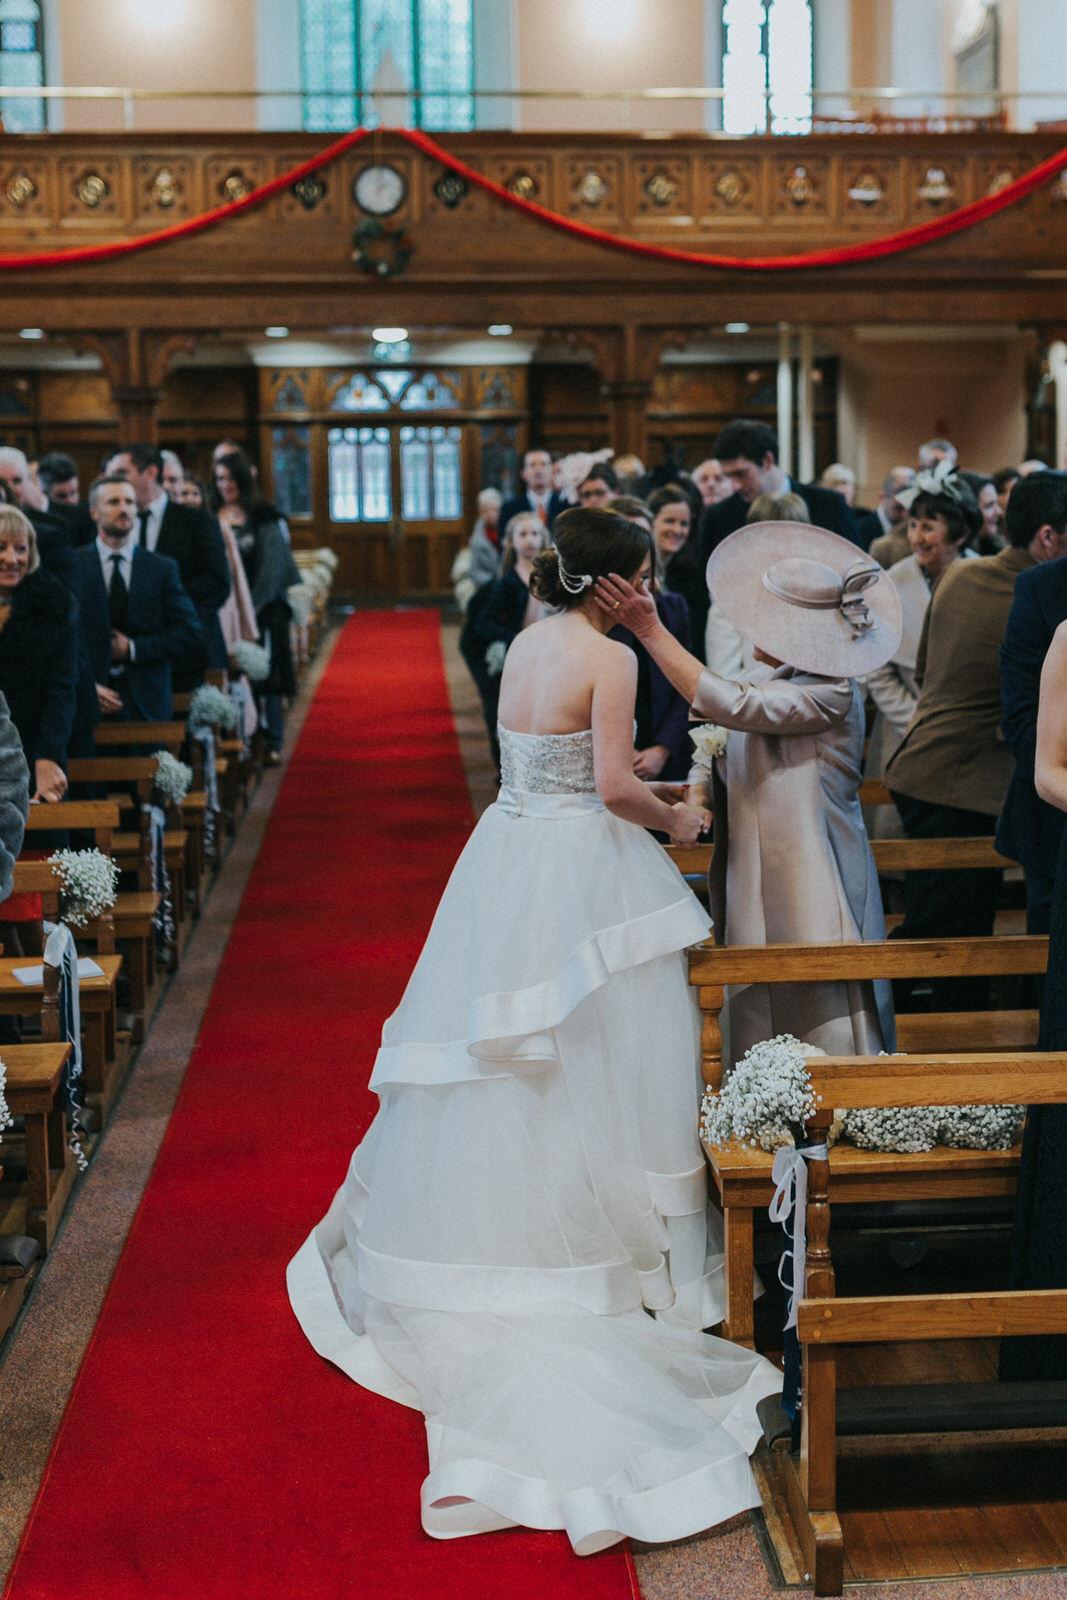 Clonabreany_wedding-photographer_roger_kenny_ireland_052.jpg